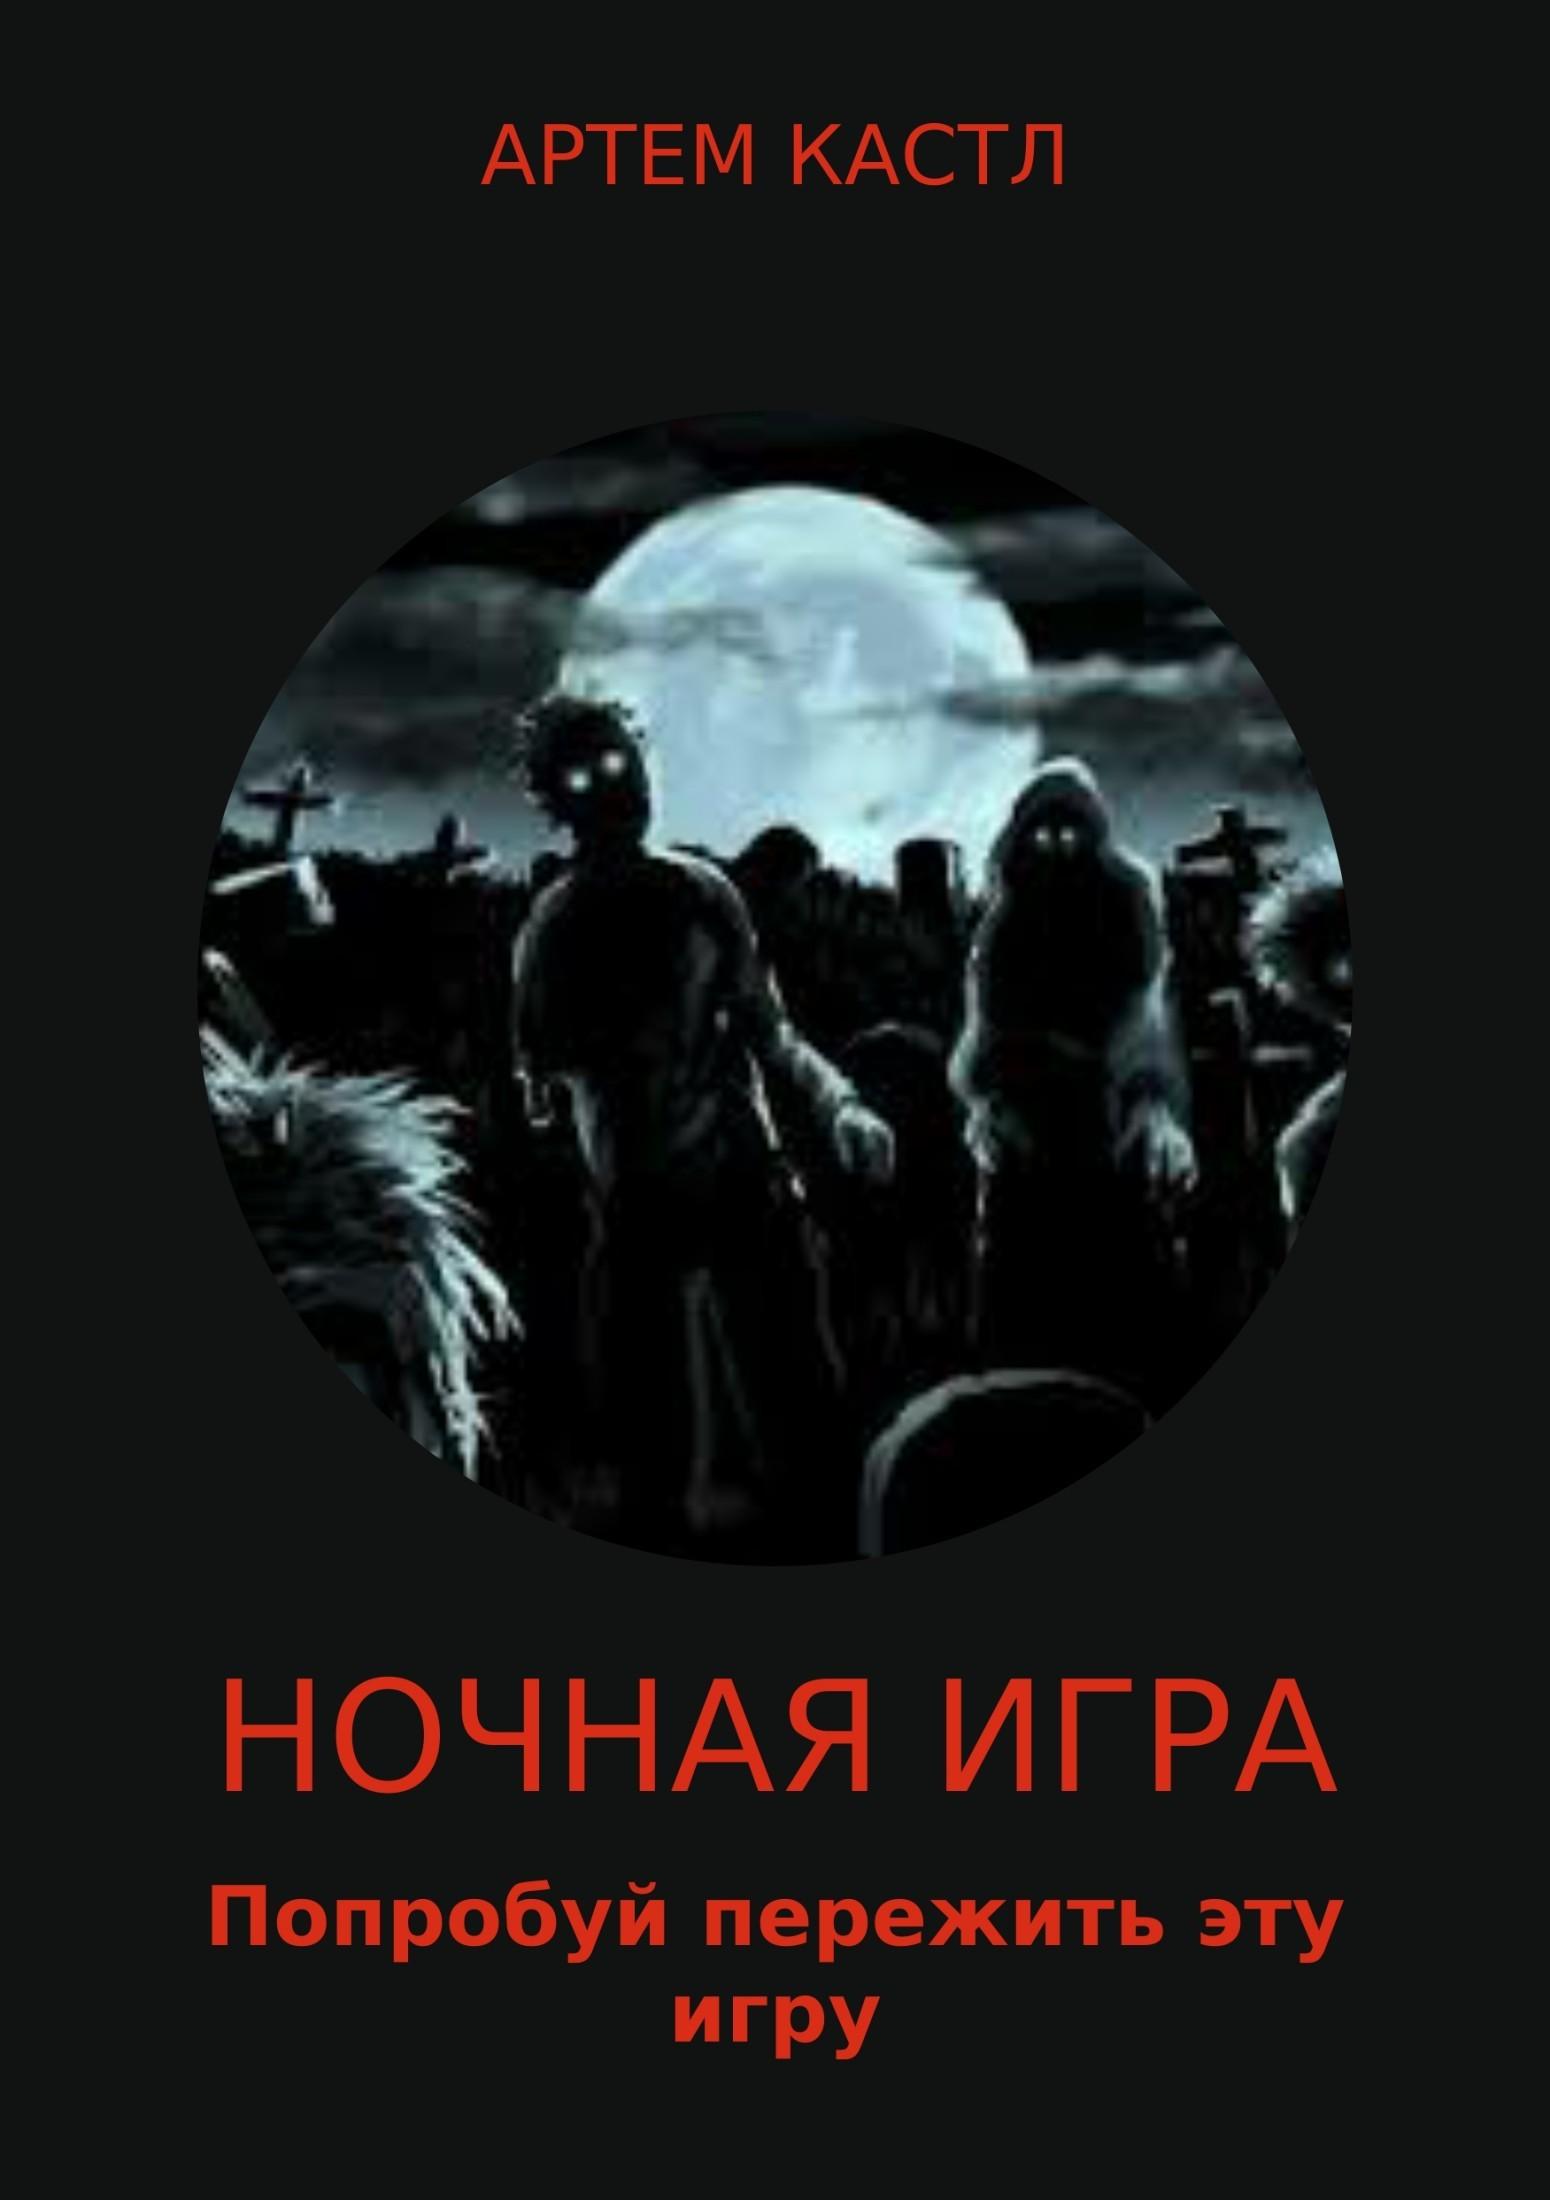 Артем Кастл бесплатно